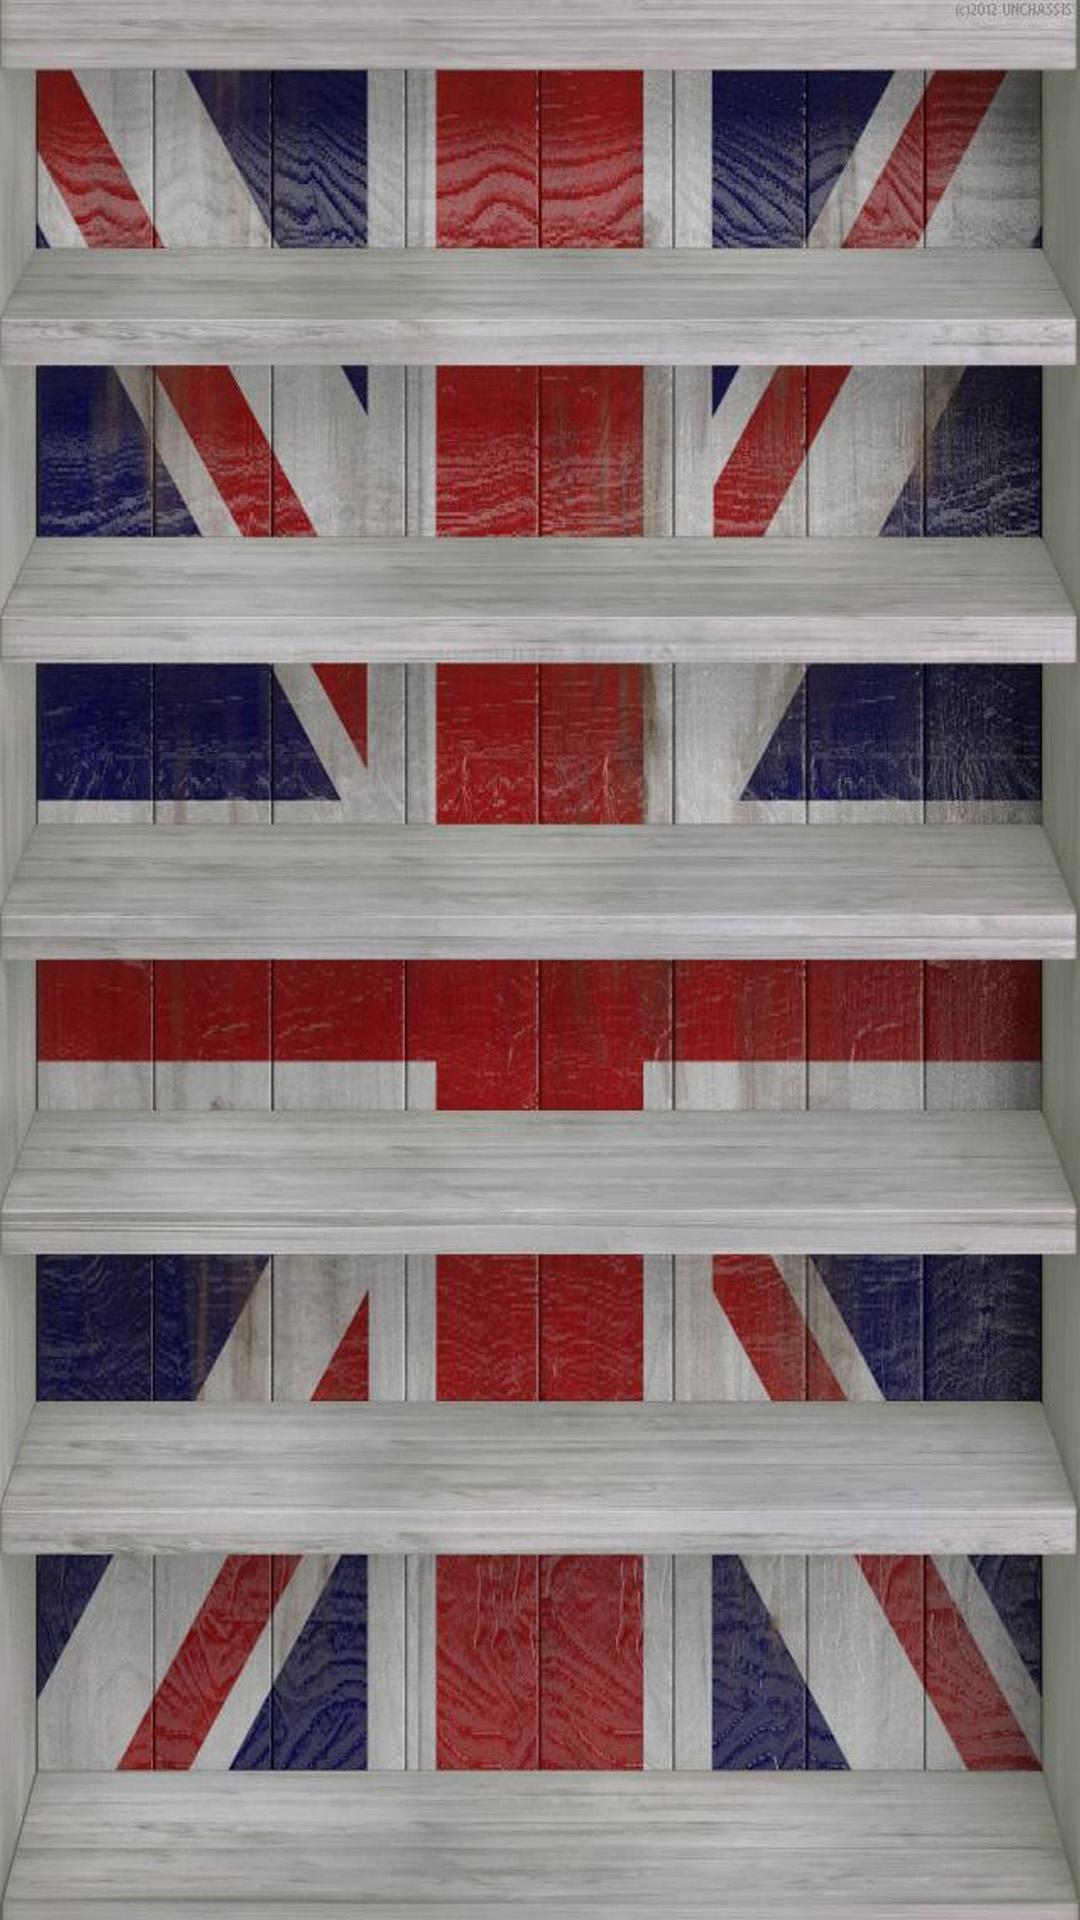 Union Jack Shelf Wallpapers Iphone Wallpaper